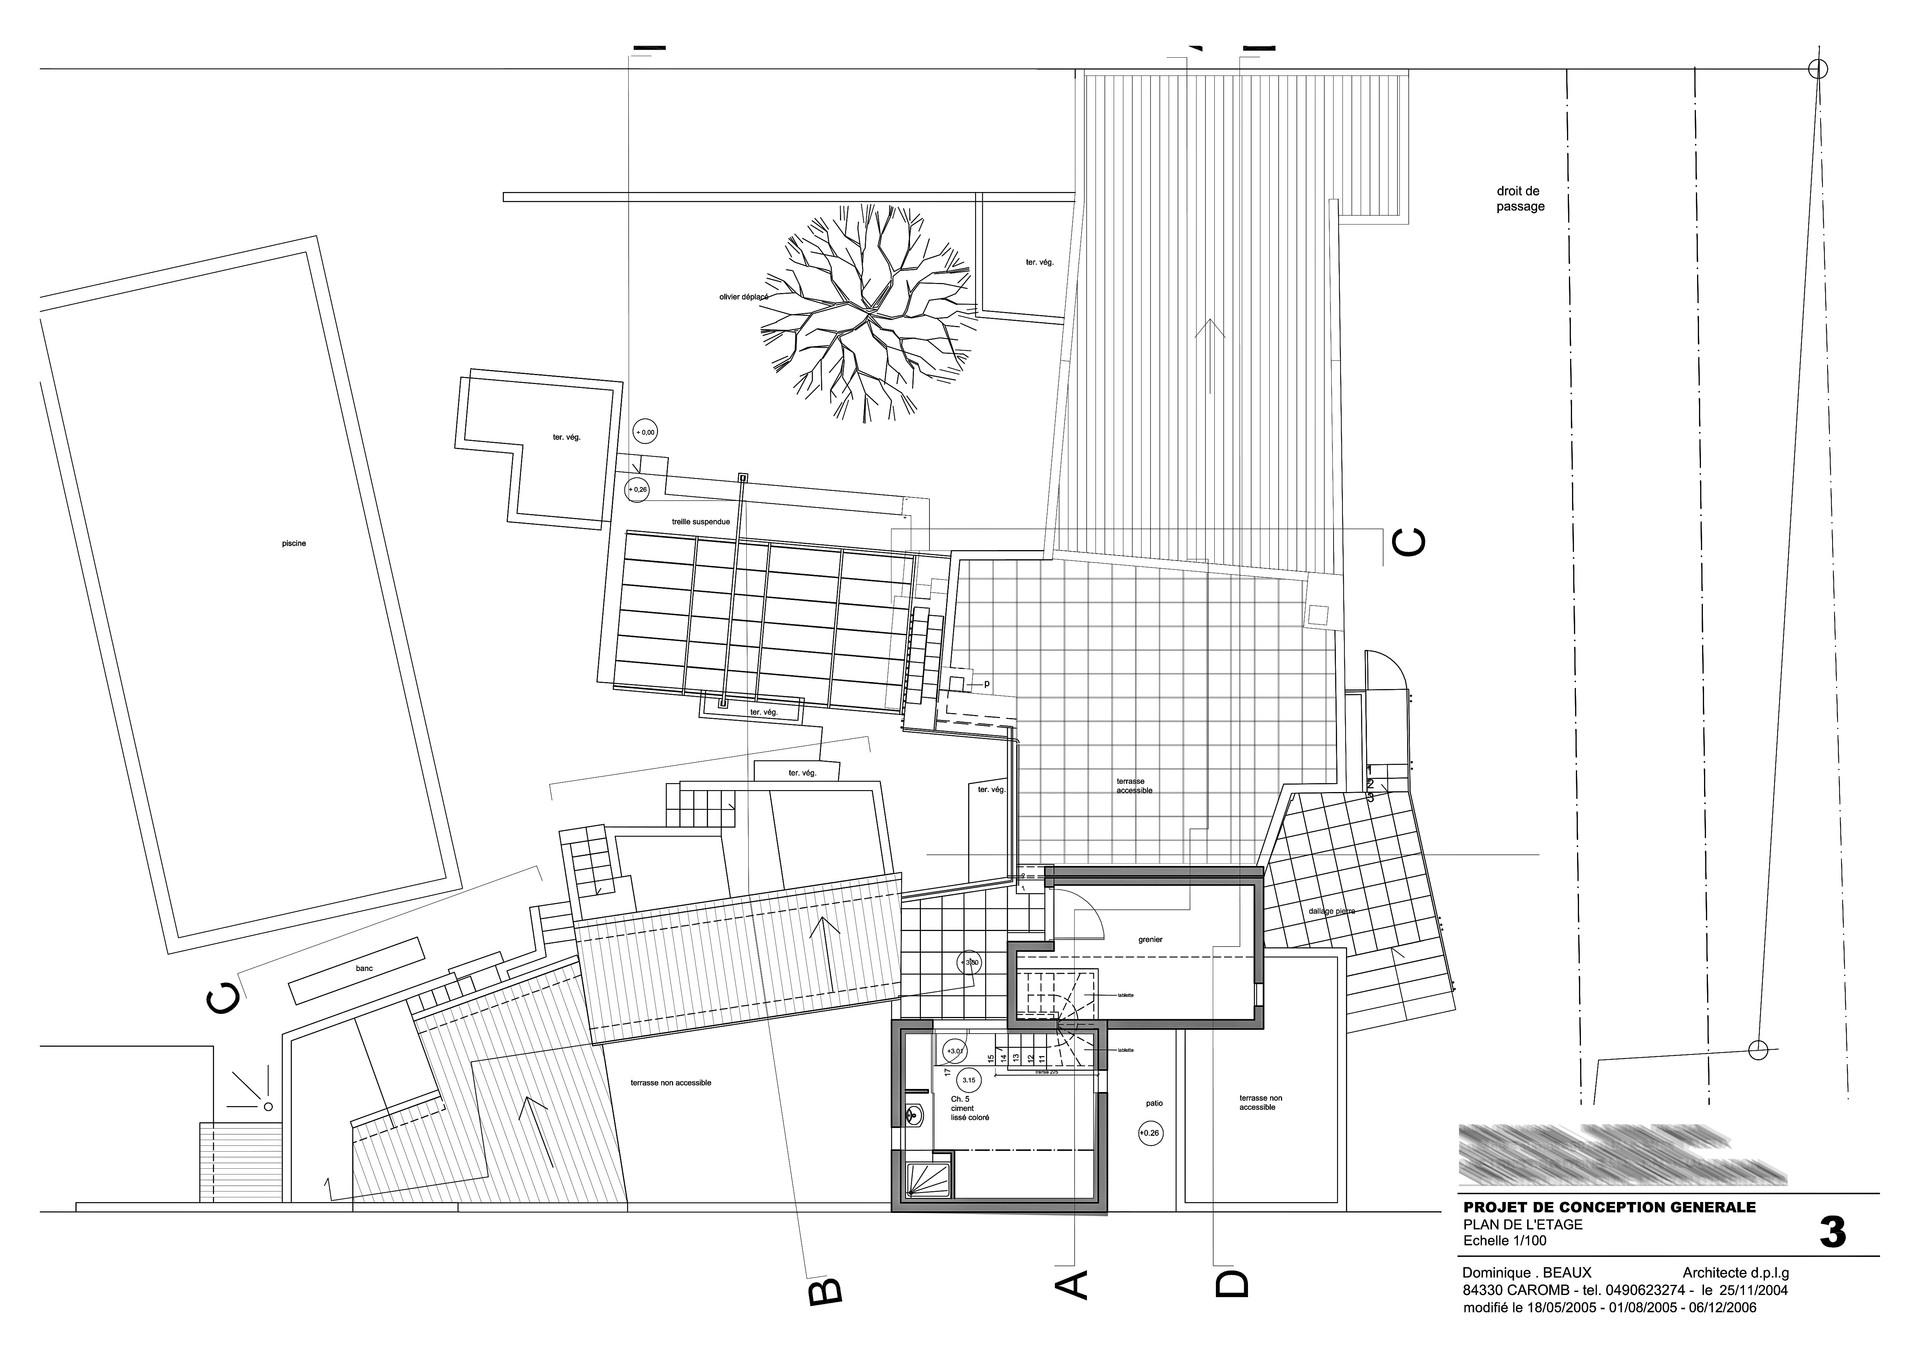 3_plan_de_l'étage.jpg